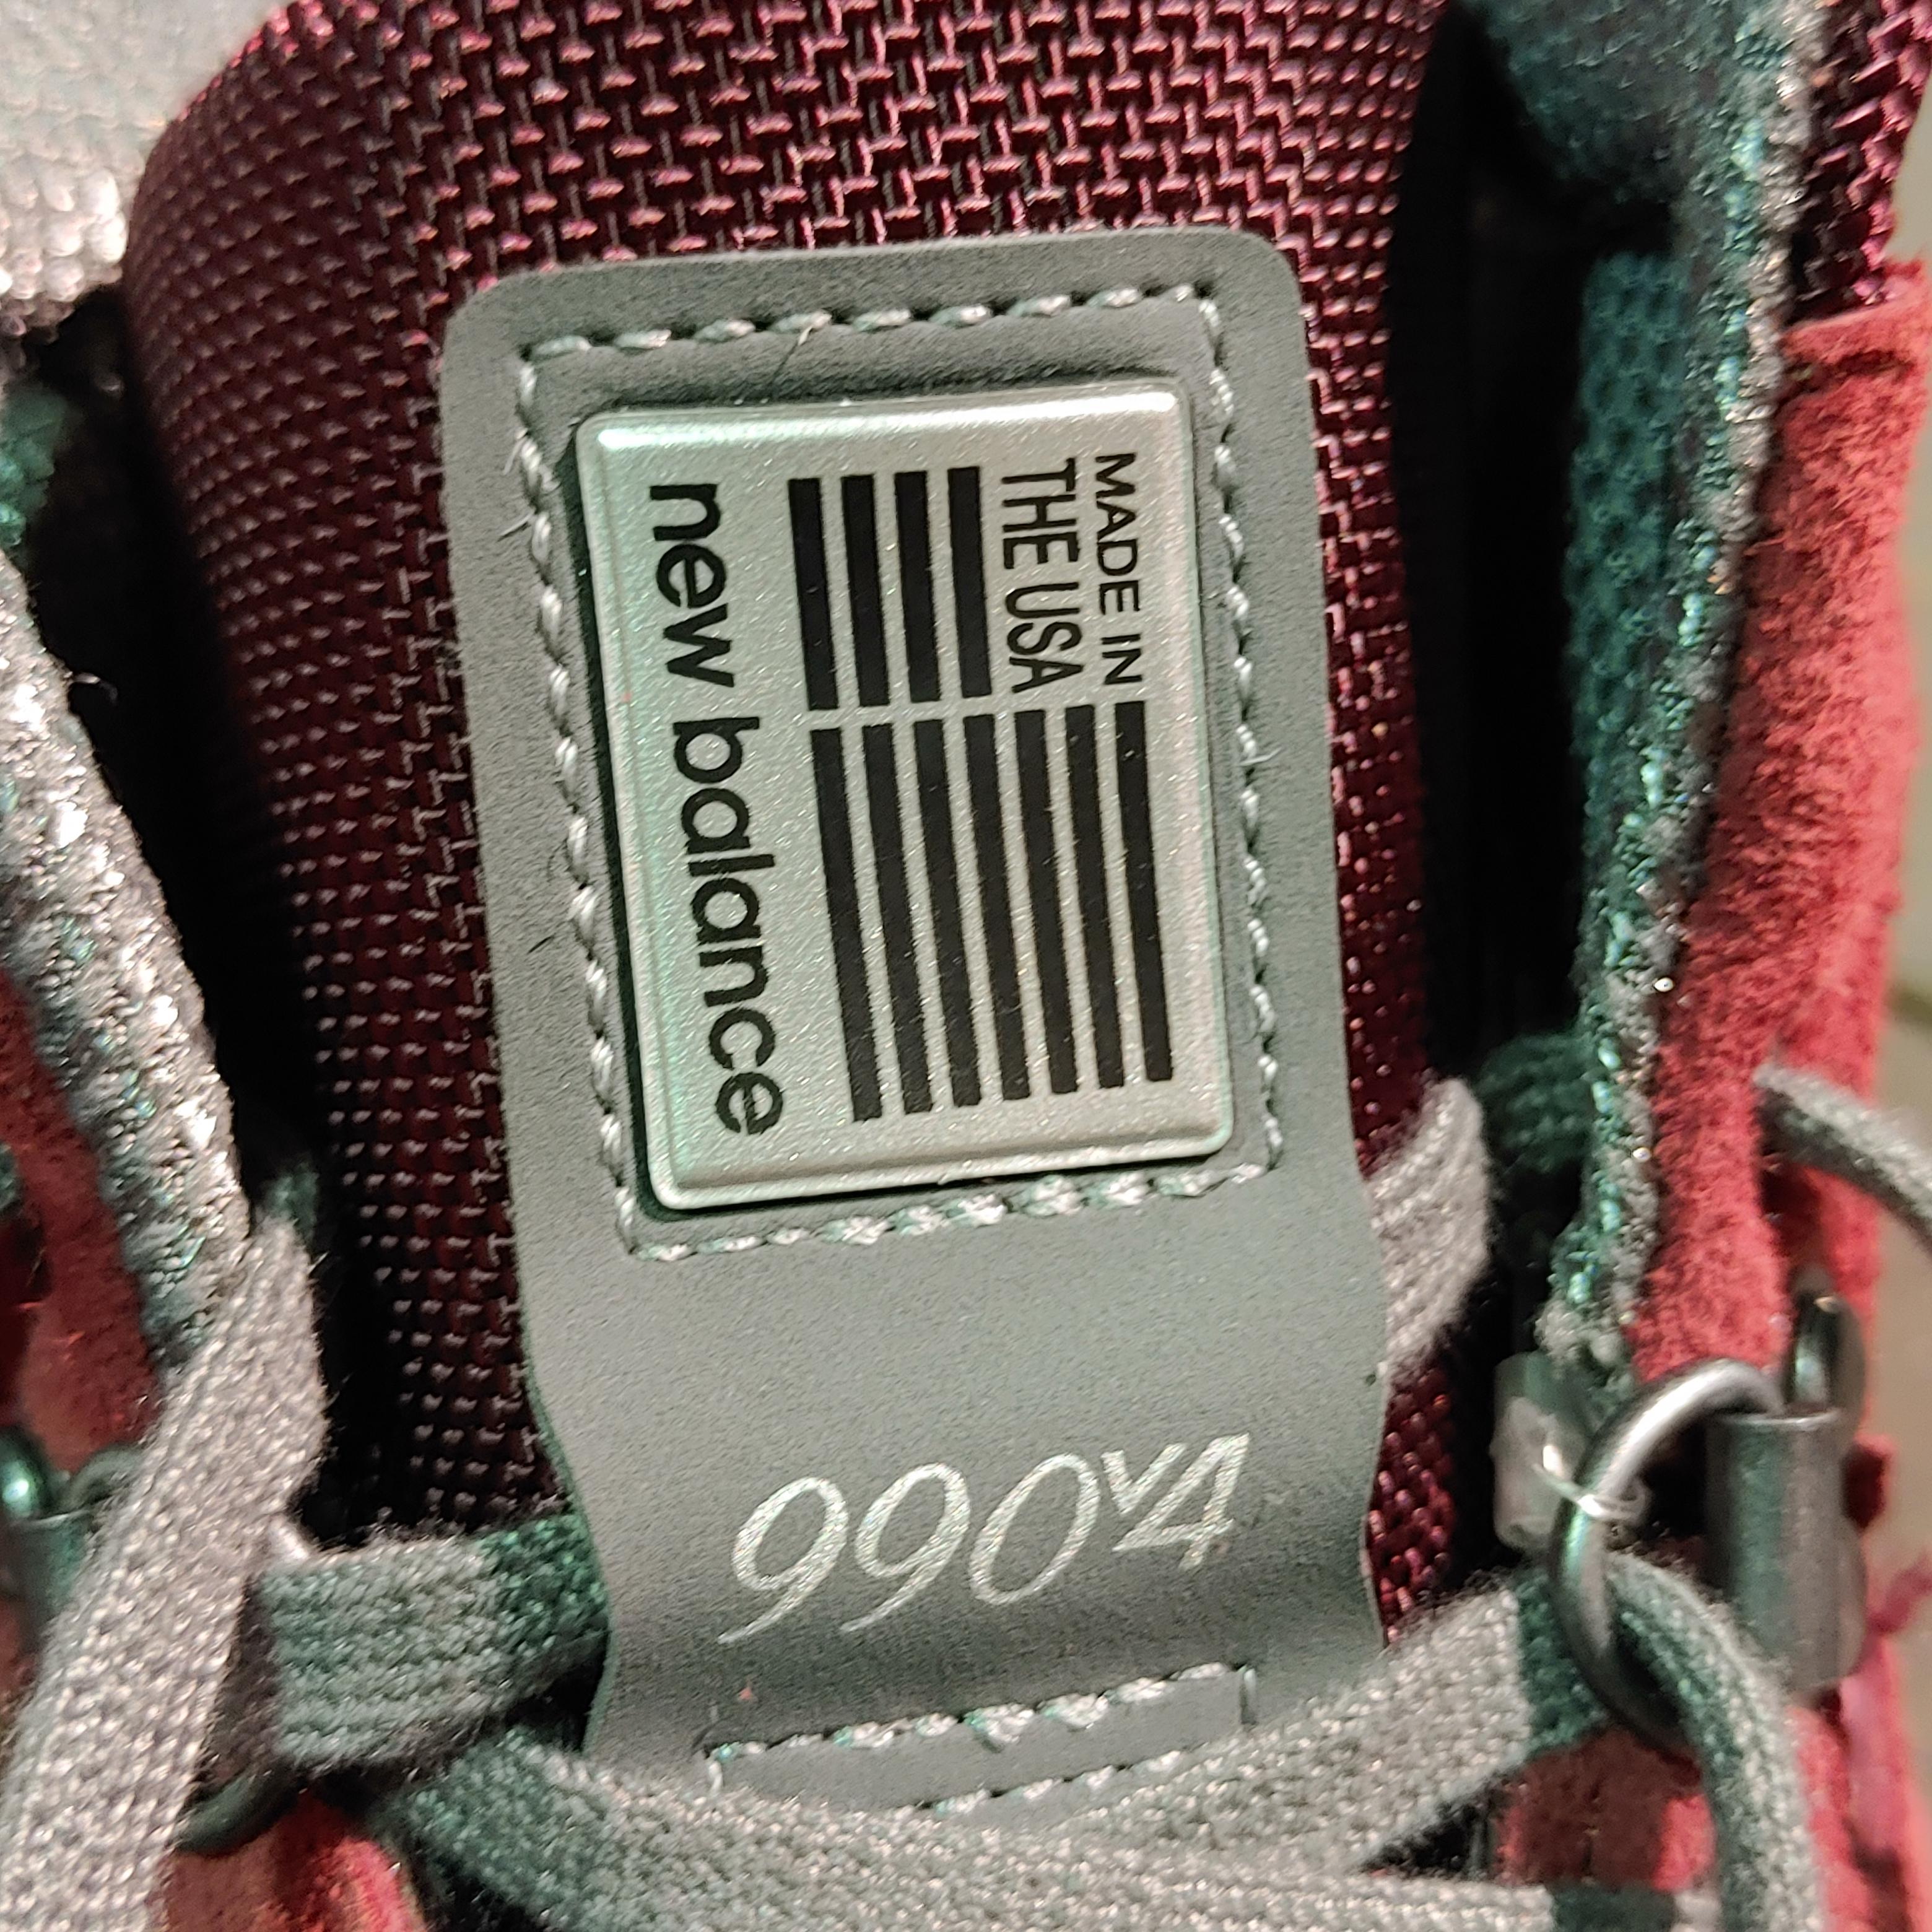 【USA】New Balance 990v4 MID CUT(US 8.5)